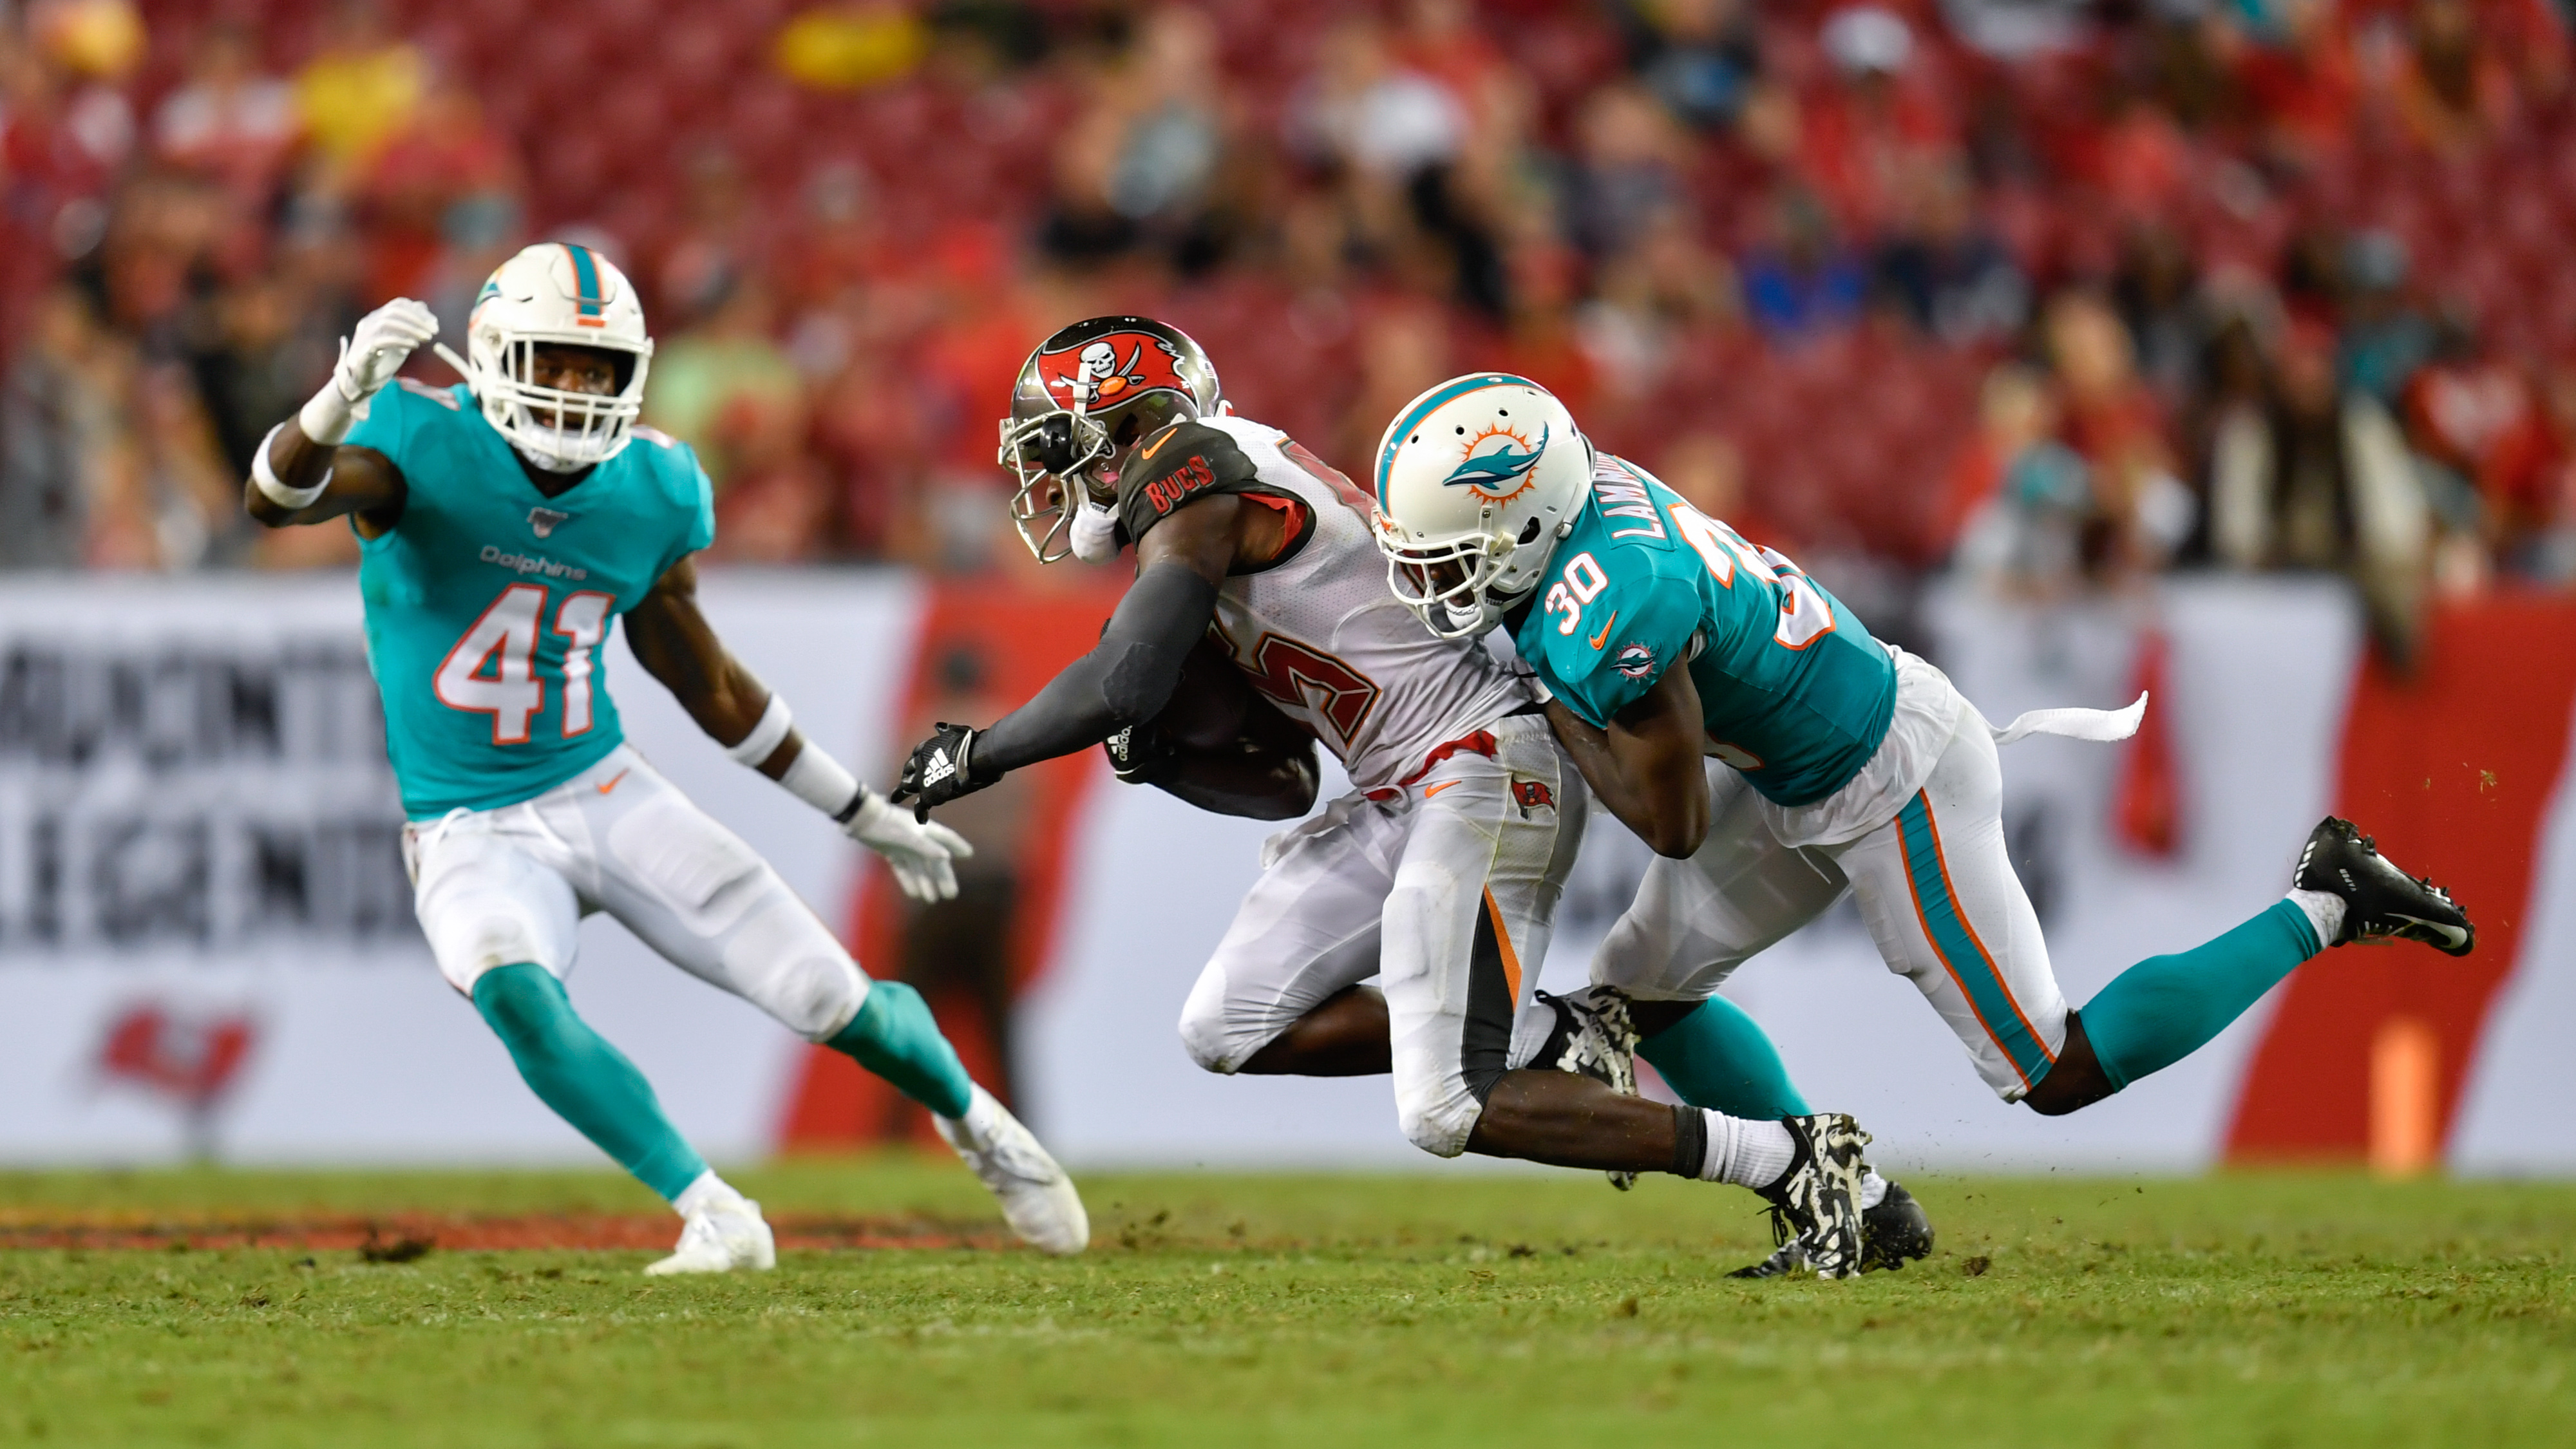 NFL: AUG 16 Preseason - Dolphins at Buccaneers